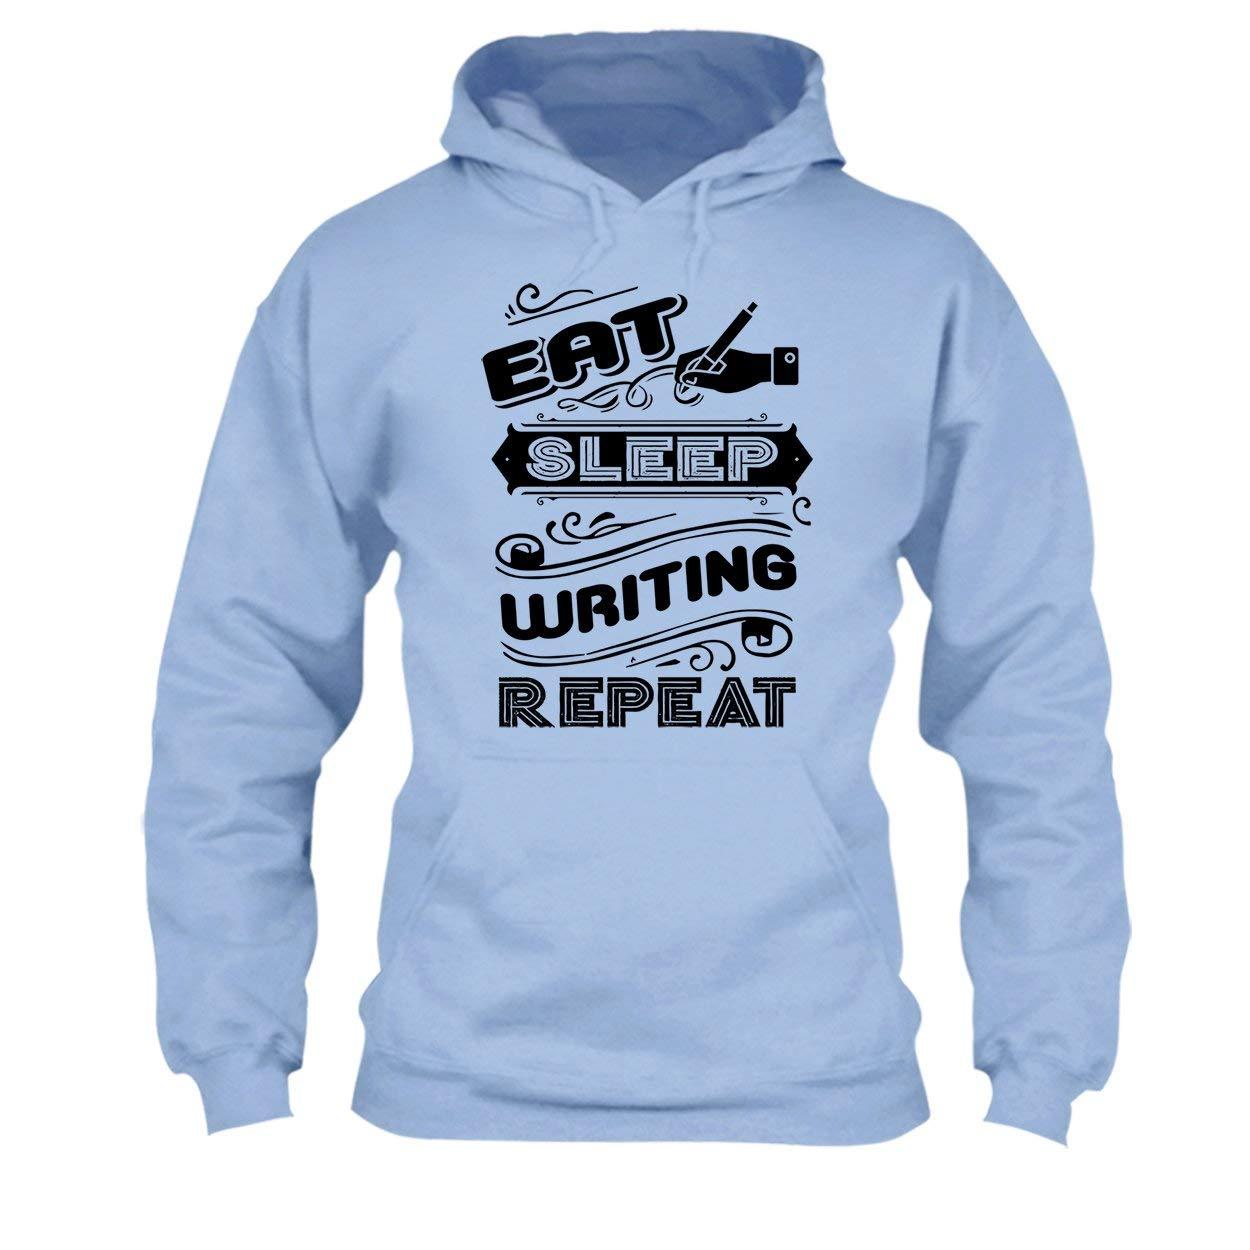 Cool Long Sleeve Shirt Eat Sleep Writing Repeat Tee Shirt